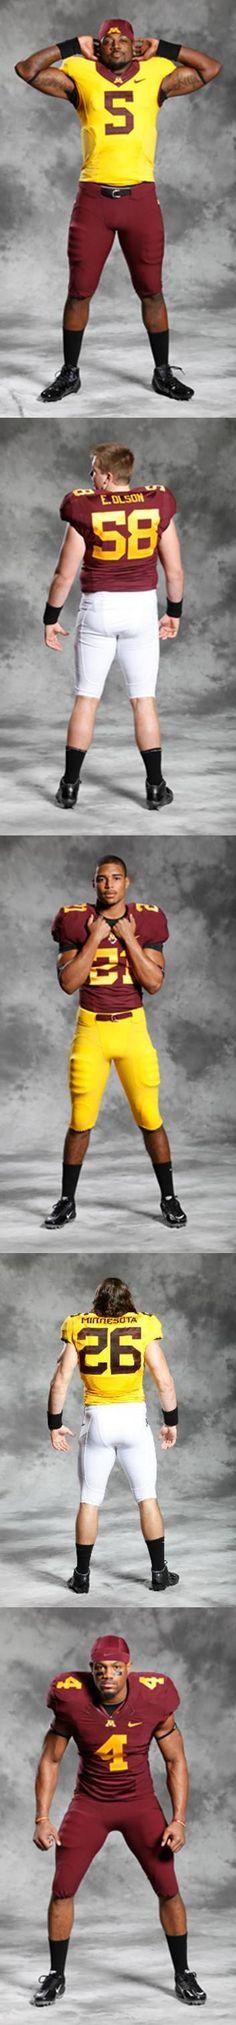 0520efacd University of Minnesota Golden Gophers - 2012 home game football uniforms -  5 pix